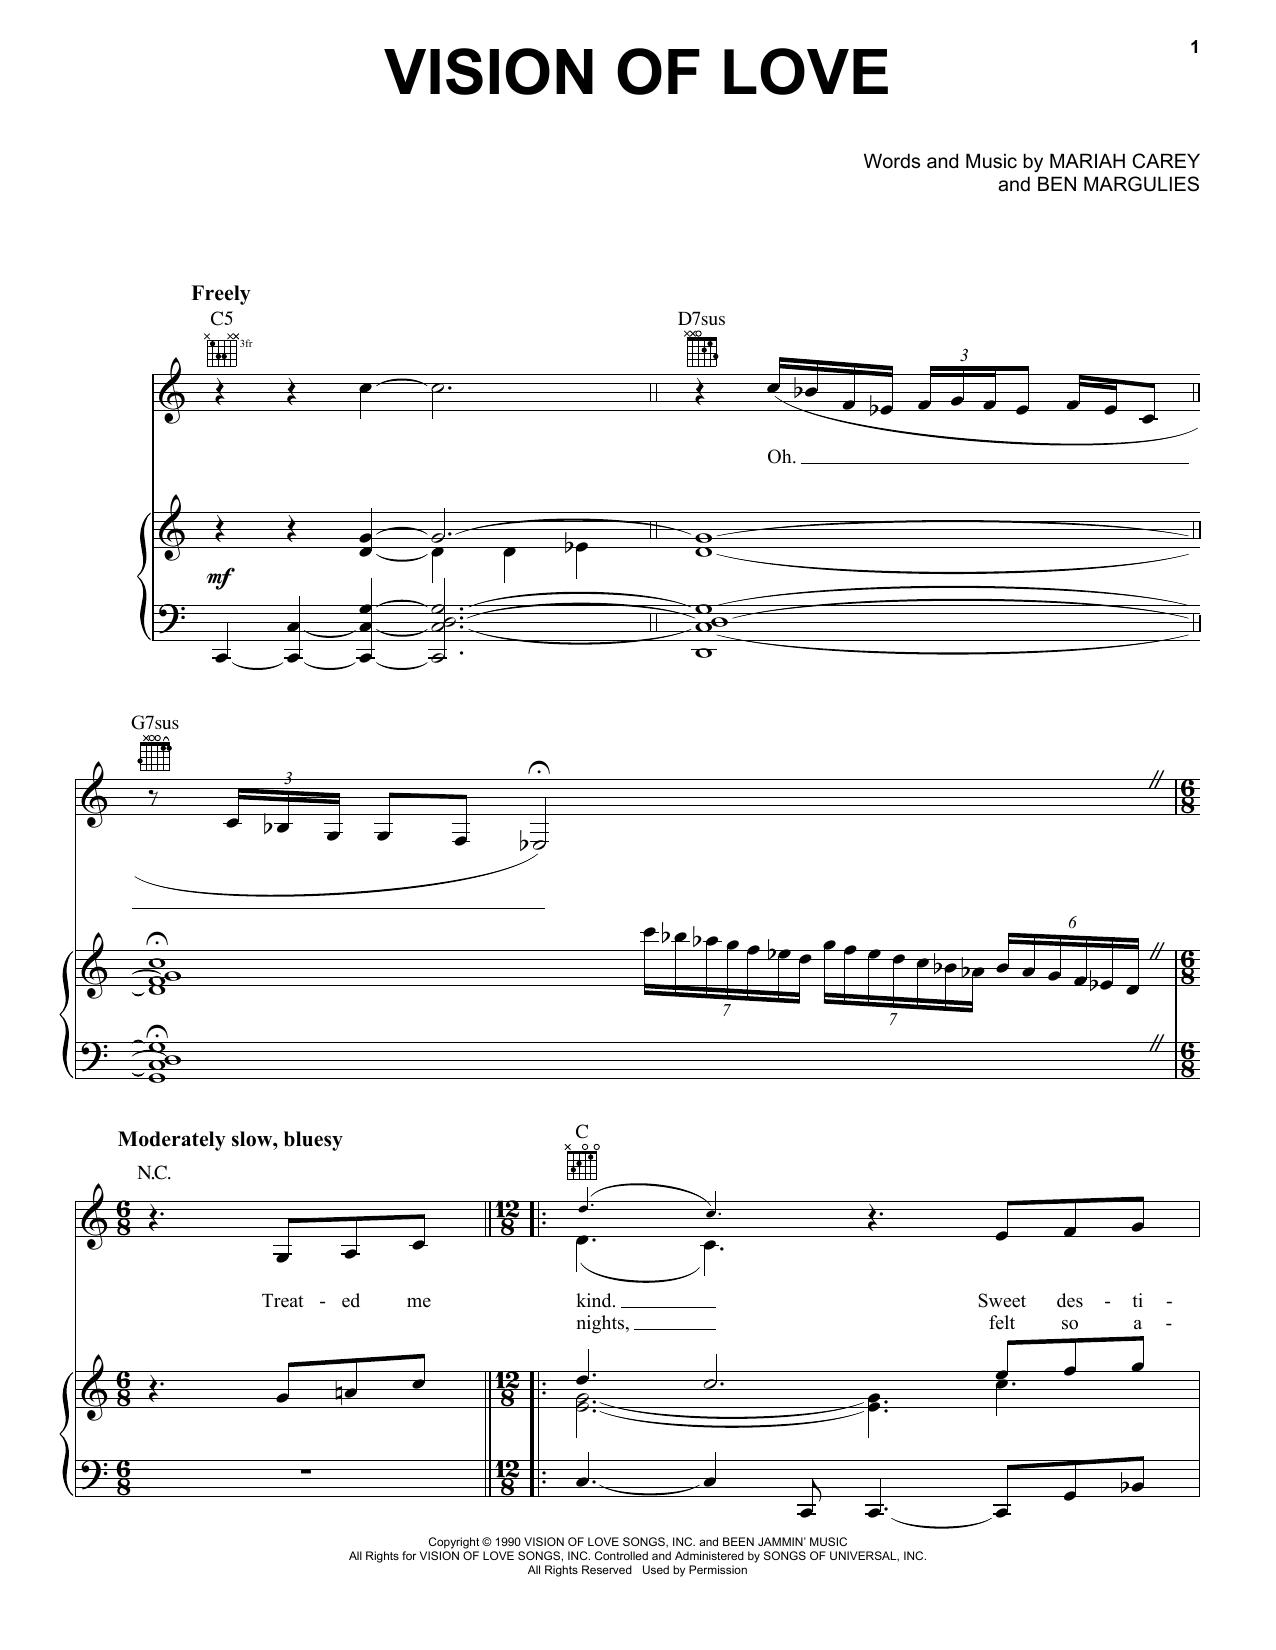 Mariah Carey Vision Of Love sheet music notes and chords. Download Printable PDF.